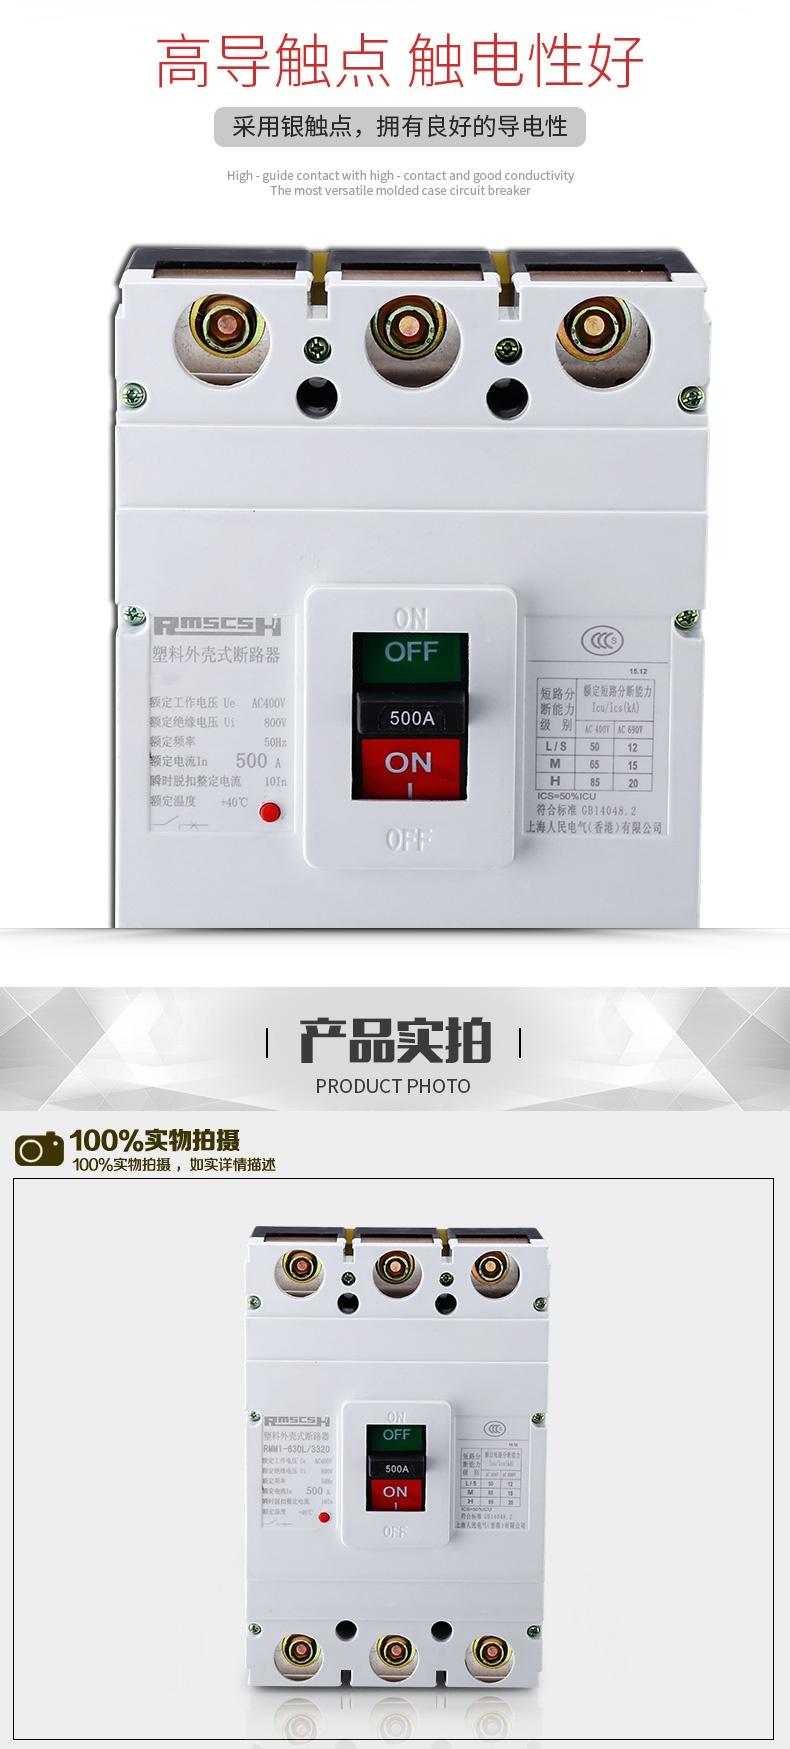 RMM1-400L/3300 塑殼斷路器868845195